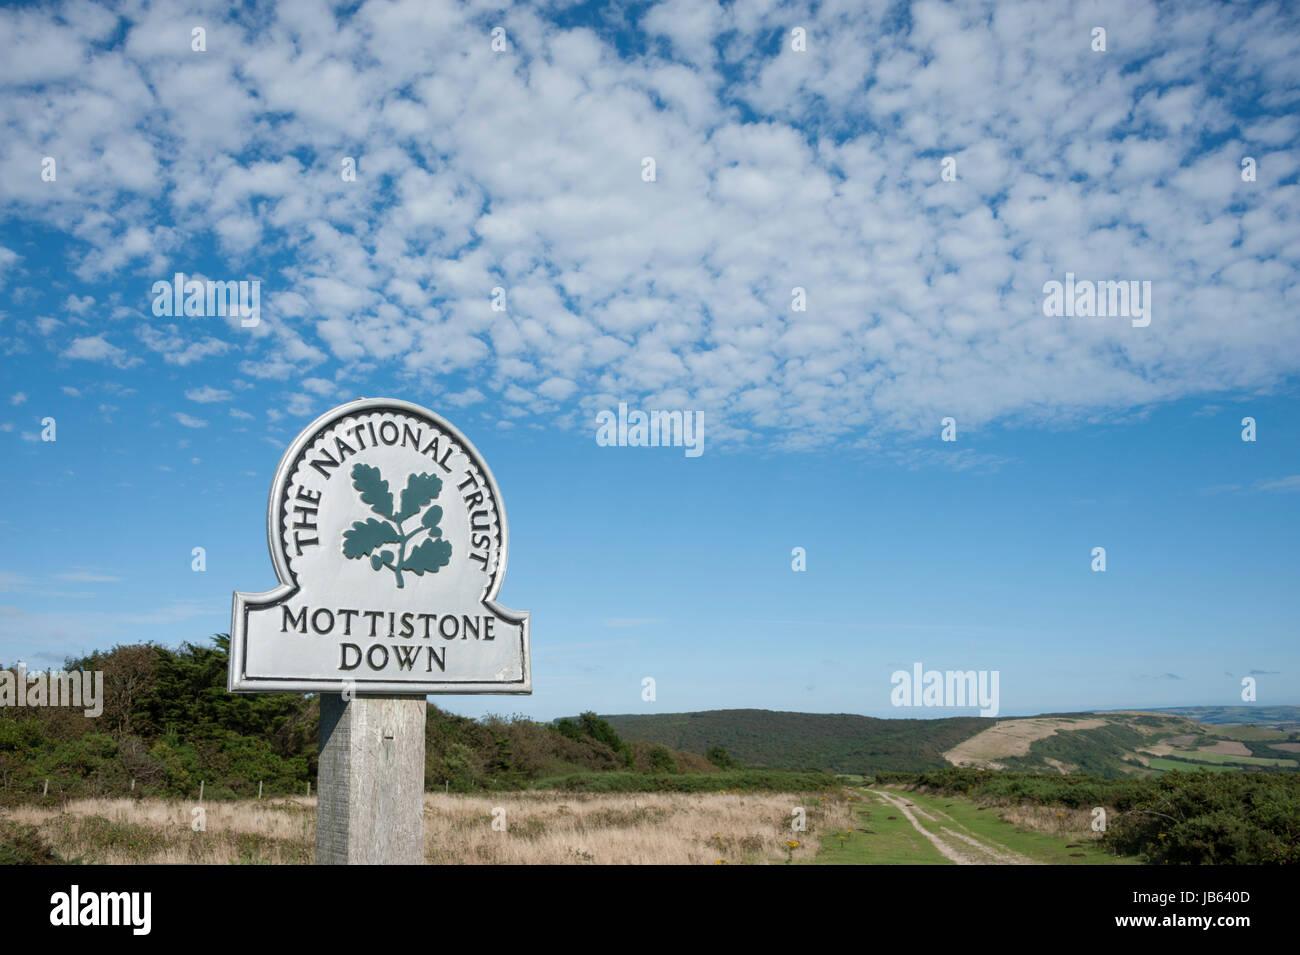 Mottistone Down, Isle of Wight - Stock Image